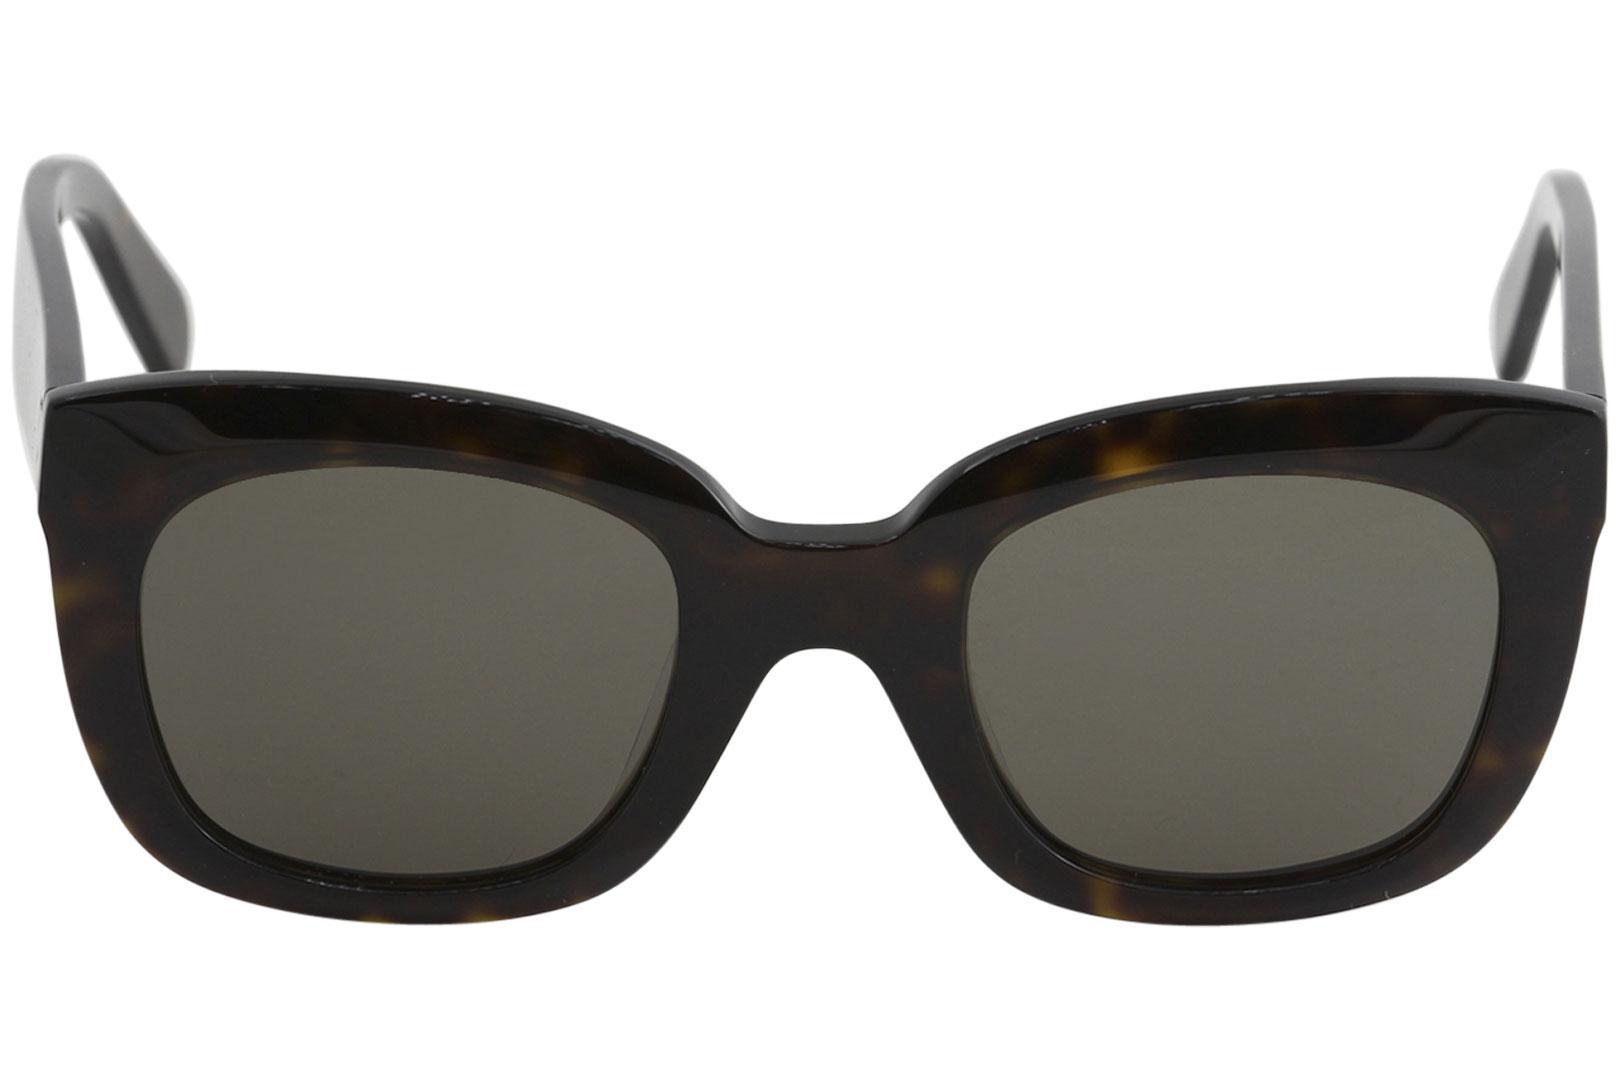 f3dcbd16905 Celine Women s CL 41385 FS 41385 F S Fashion Sunglasses by Celine. 1234